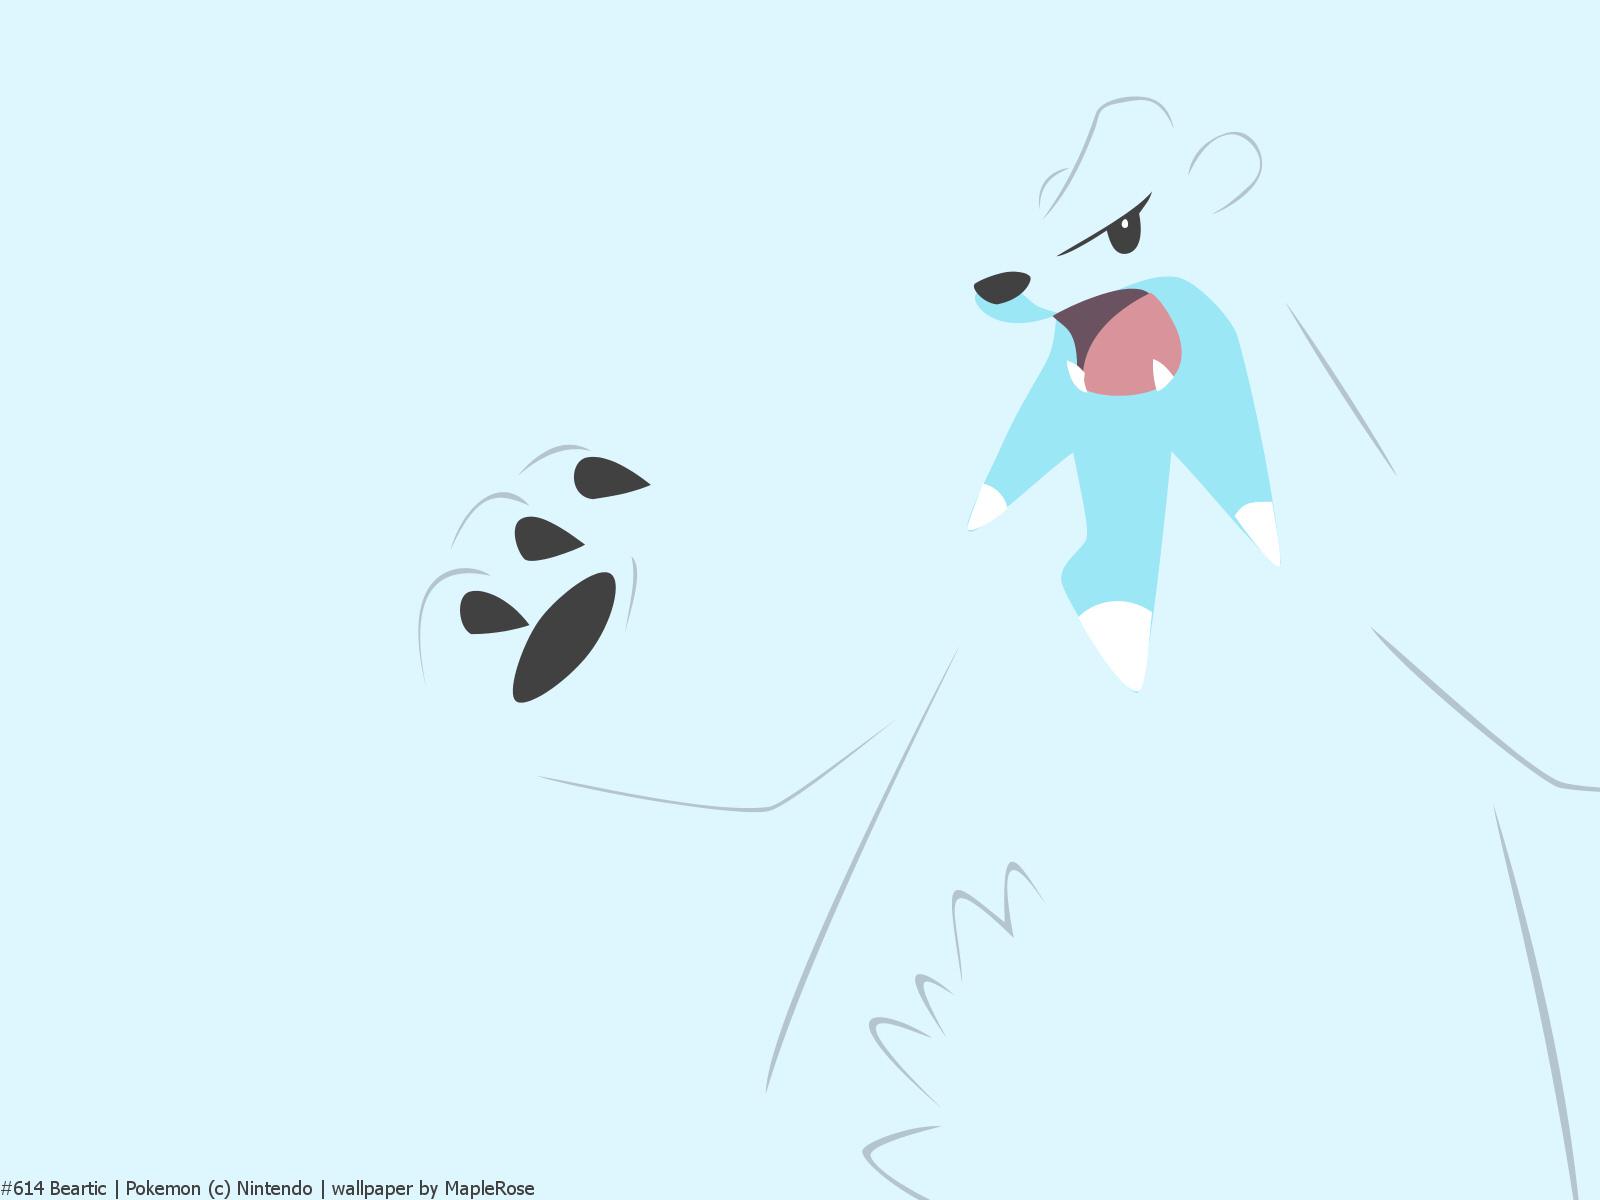 #614 Beartic | PokéWalls